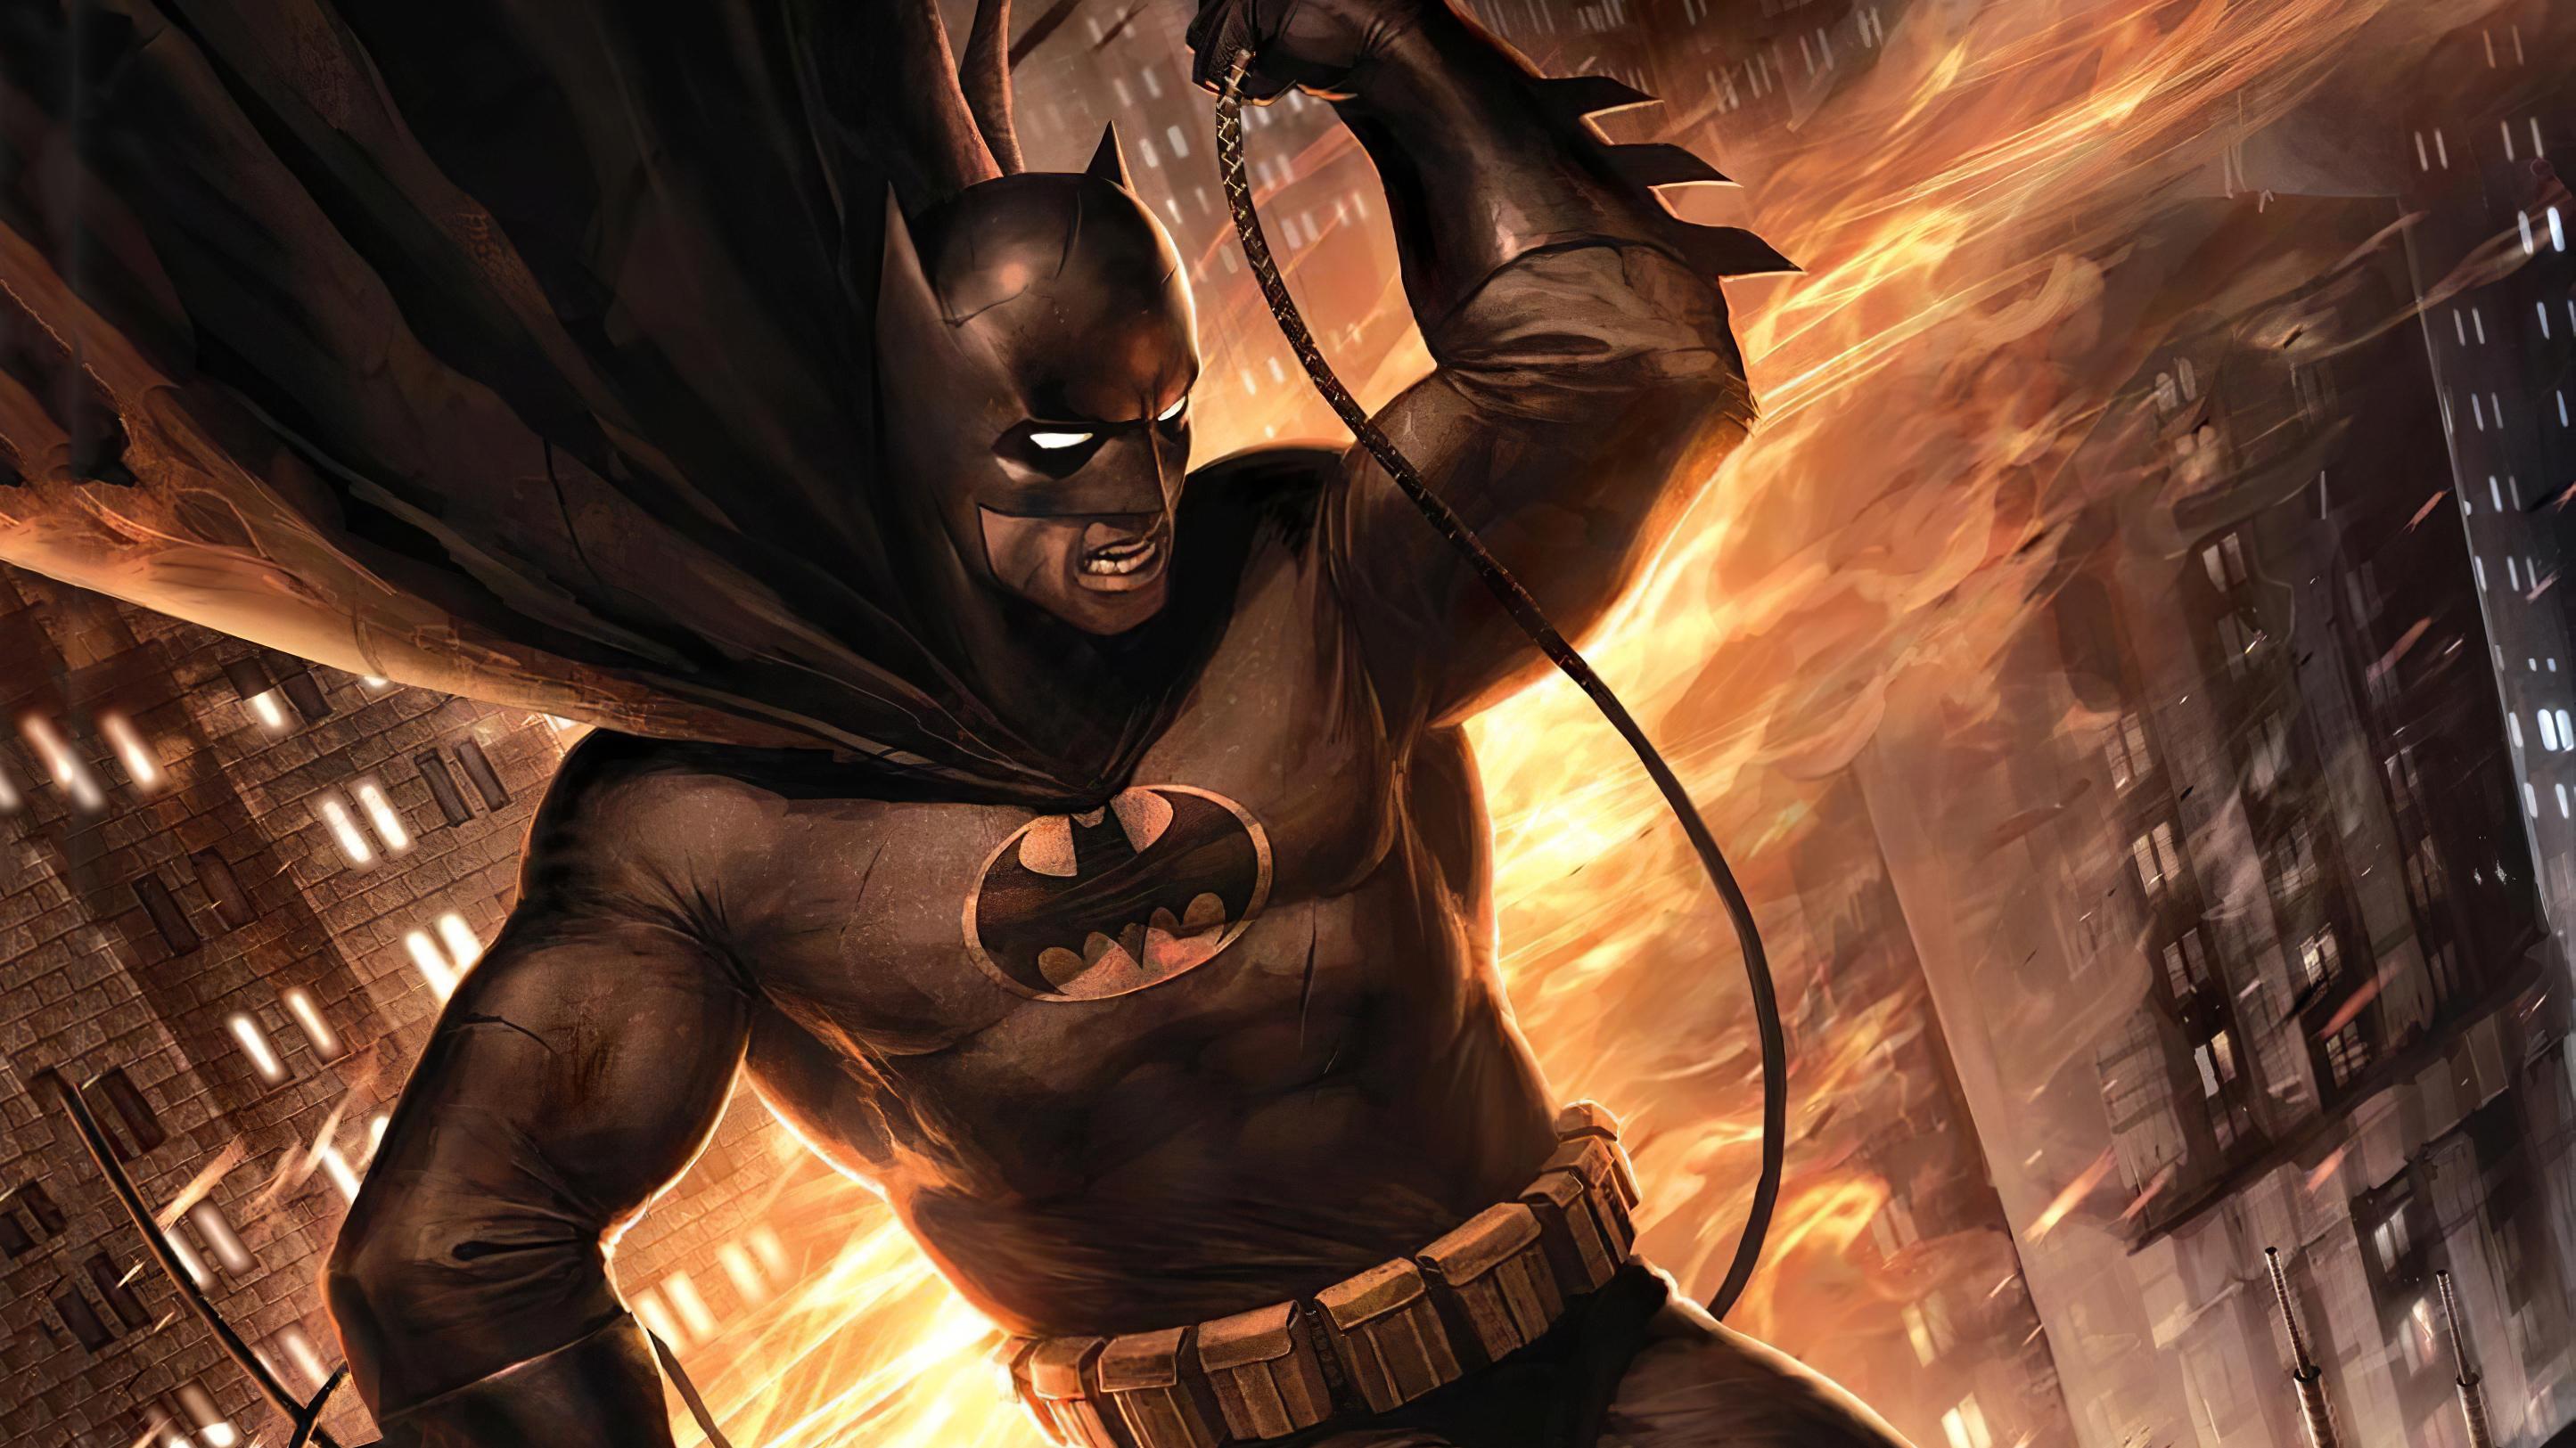 Batman The Dark Knight Returns Artwork Hd Superheroes 4k